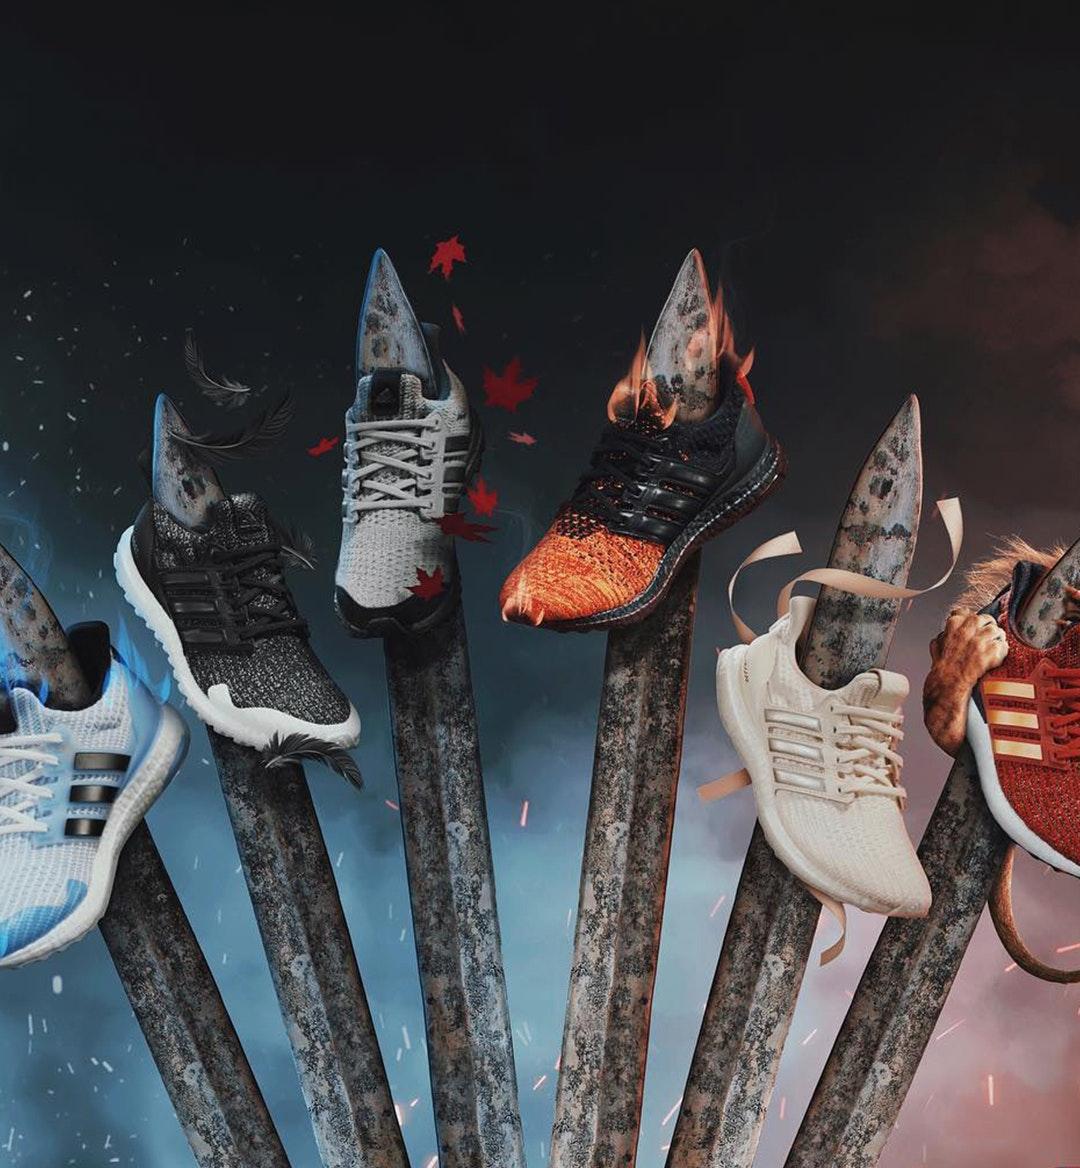 Game of Thrones' Brand Partnerships: 8 Final Season Merch